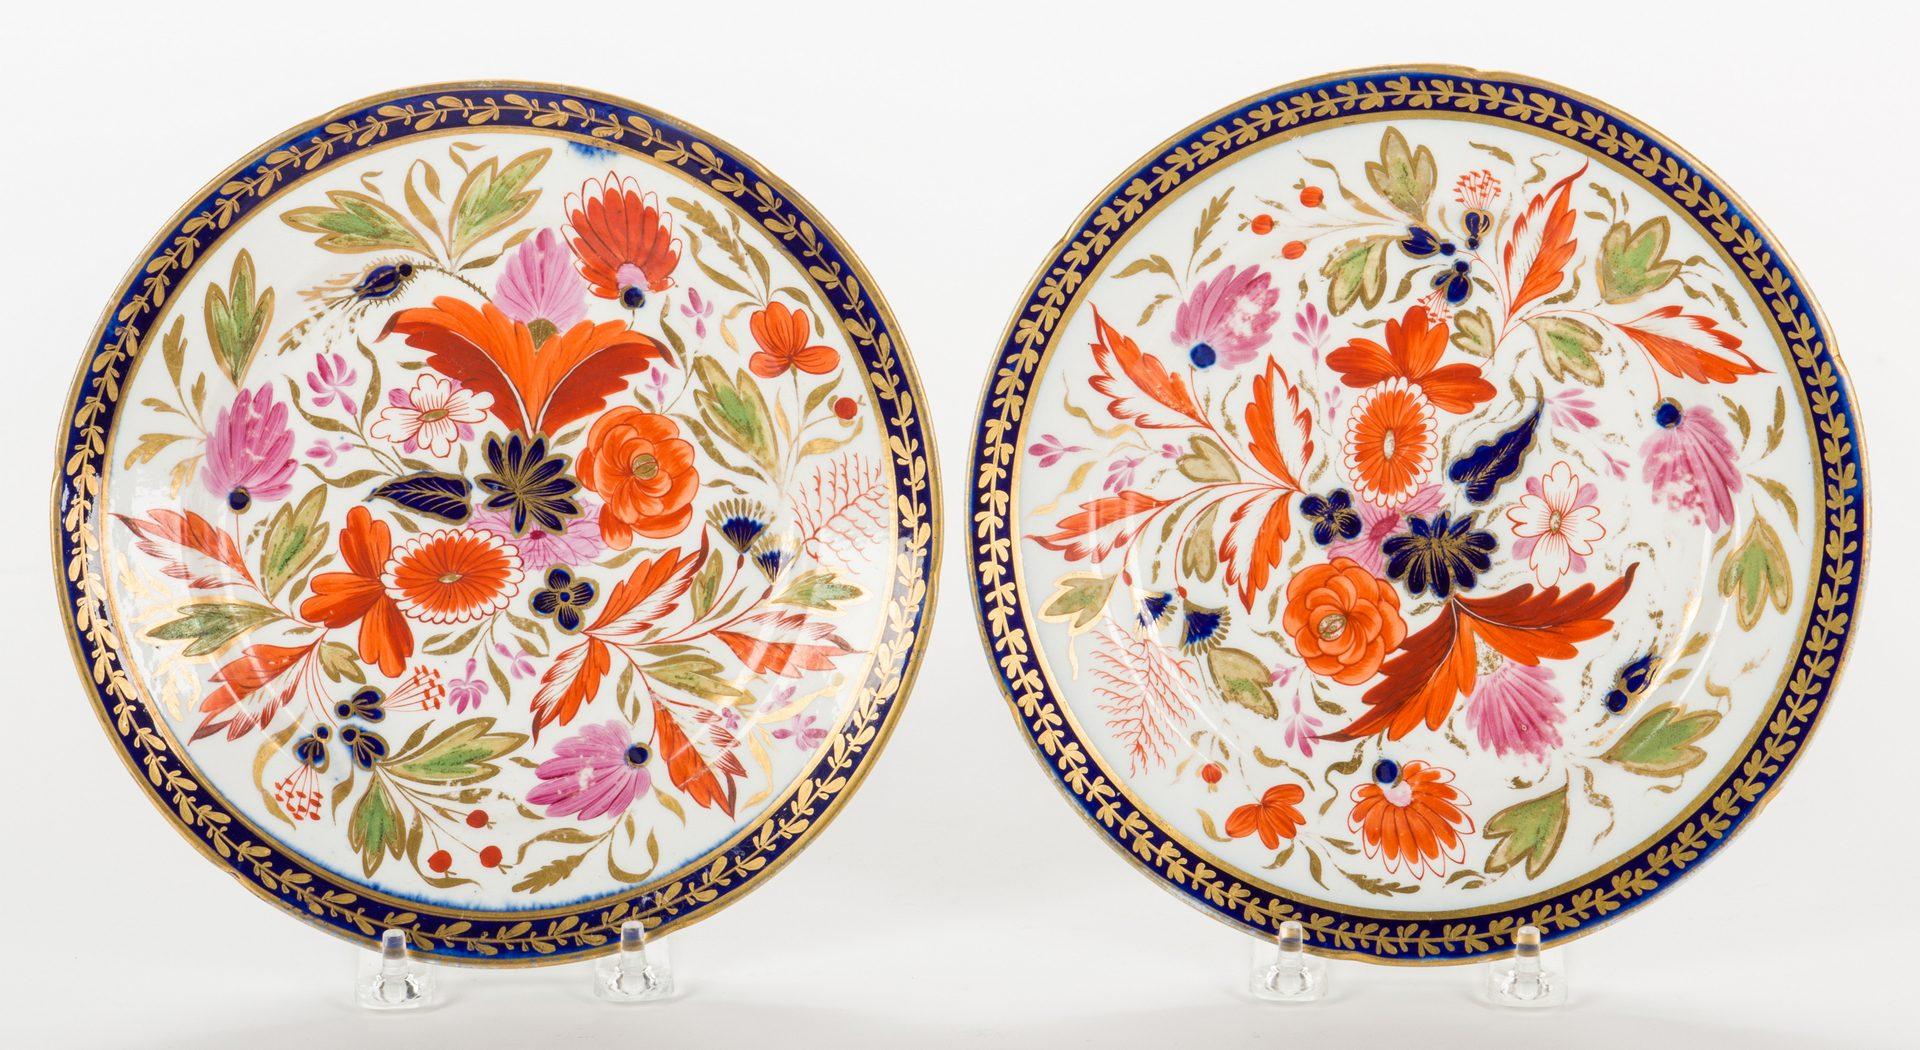 Lot 643: 6 English Ceramic Plates & Staffordshire Dog, 7 items total